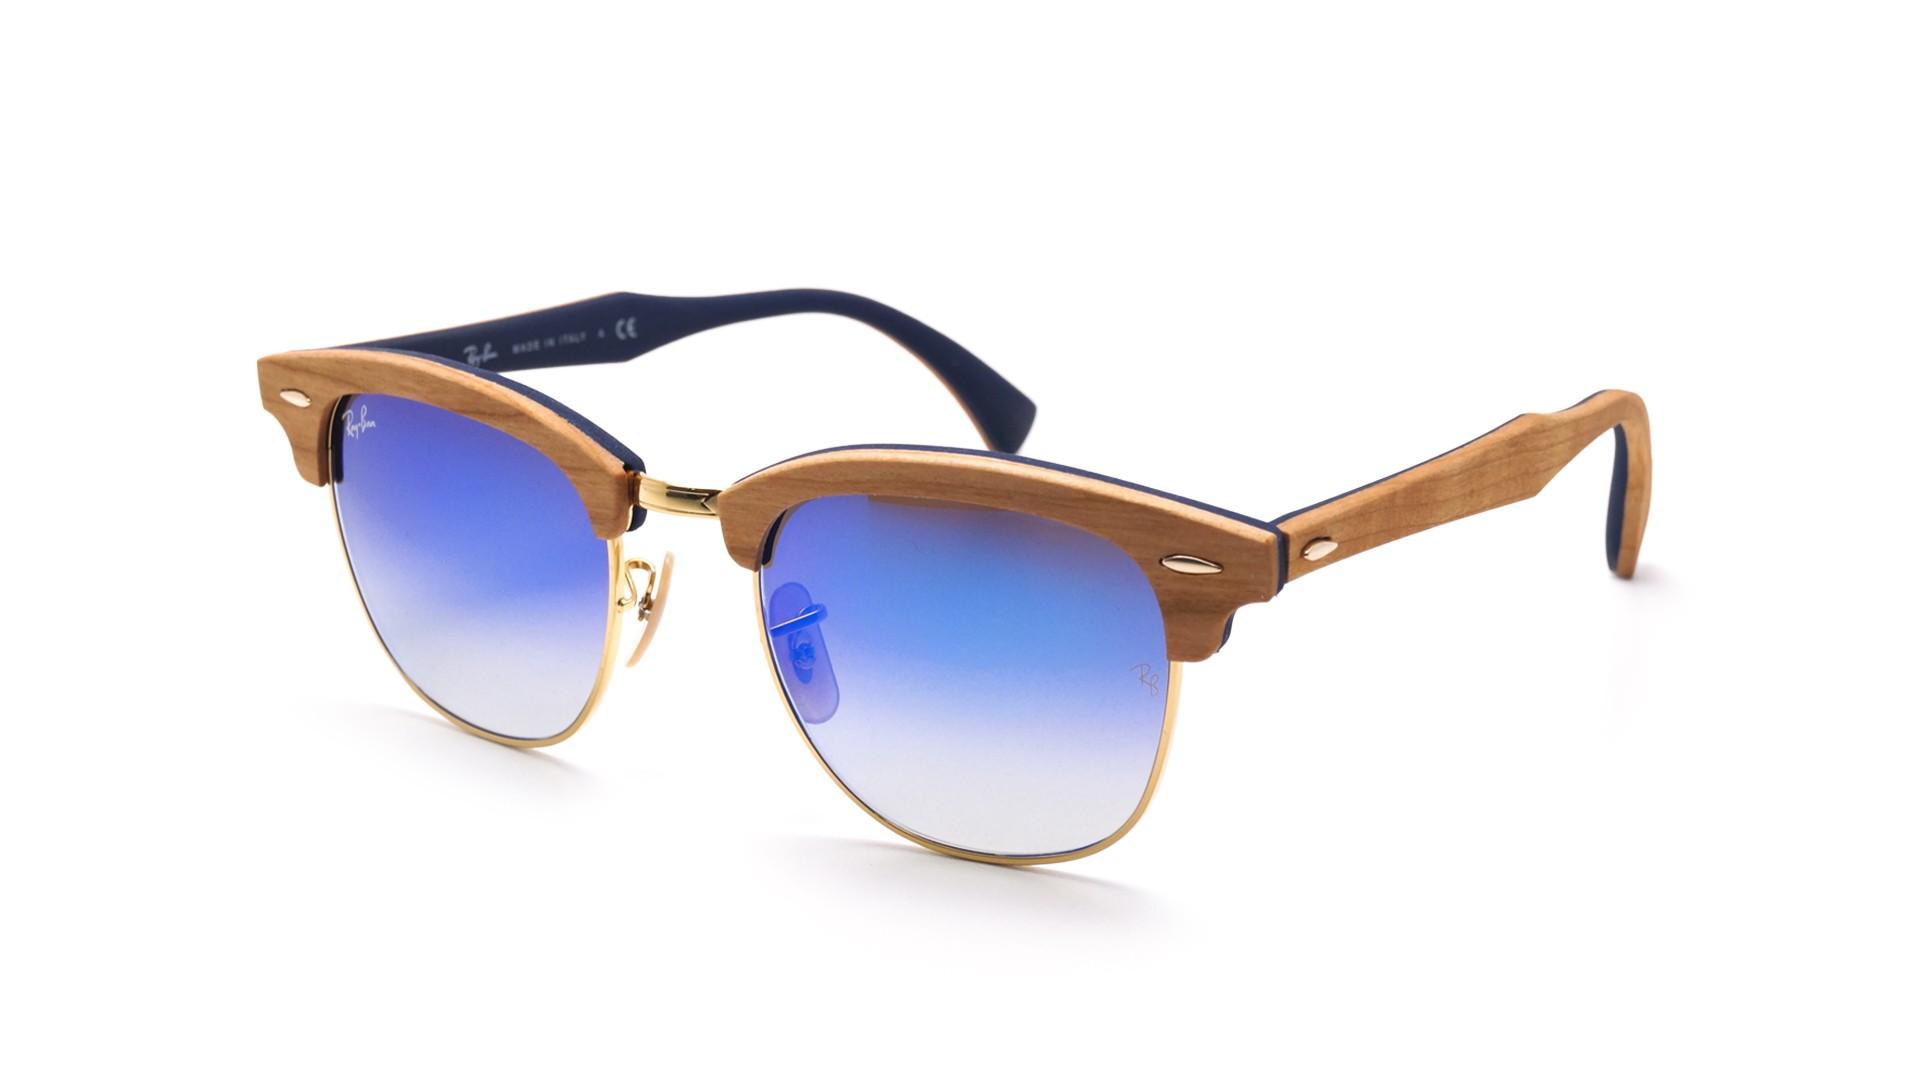 262d4d41b2 Sunglasses Ray-Ban Clubmaster Wood Brown Matte RB3016M 11807Q 51-21 Medium  Gradient Mirror